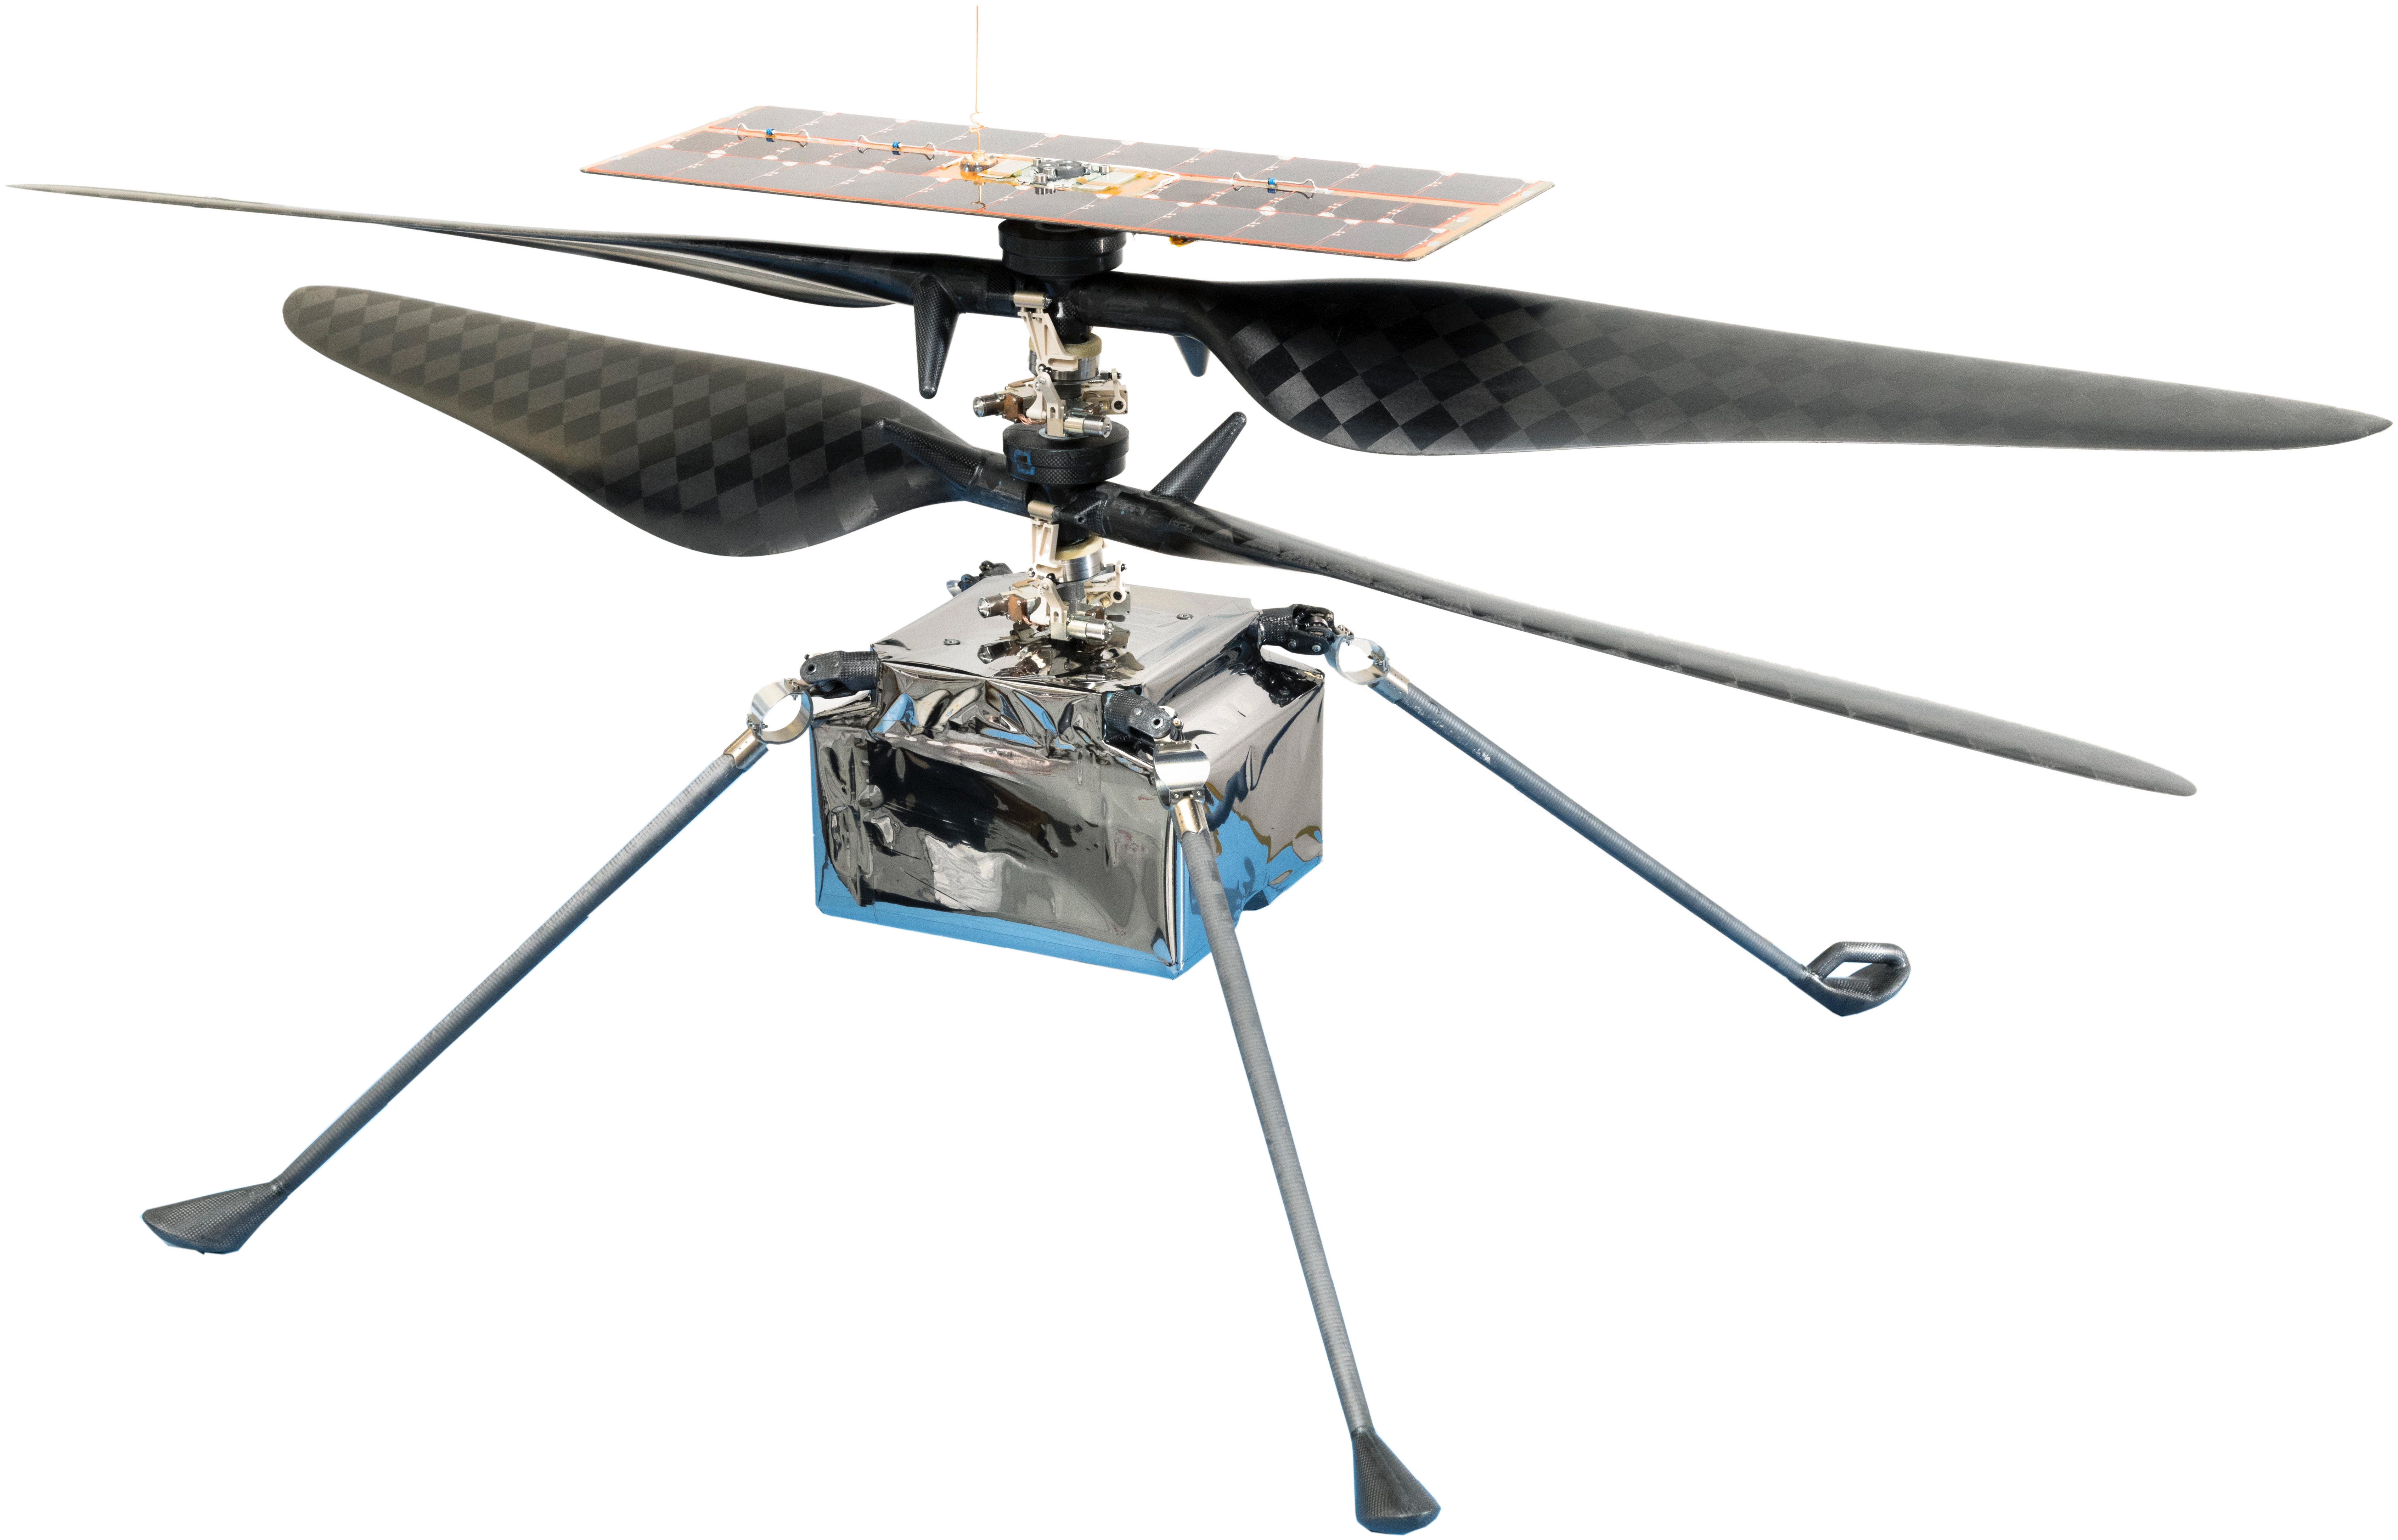 https://upload.wikimedia.org/wikipedia/commons/e/e5/PIA23882-MarsHelicopterIngenuity-20200429_%28trsp%29.png